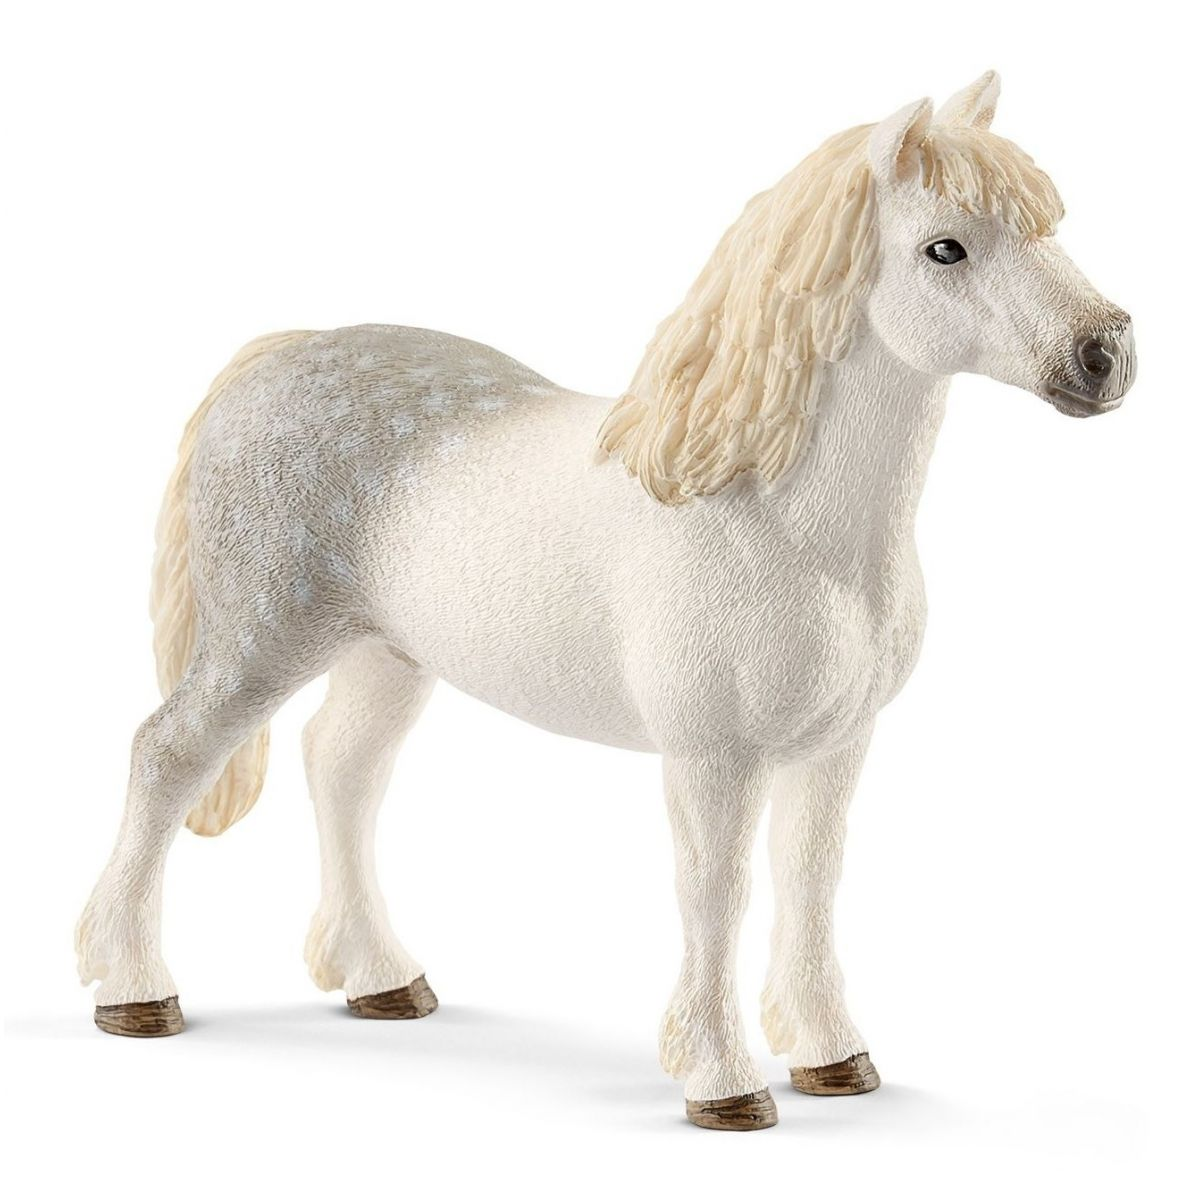 Schleich 13871 Waleský poník žrebec